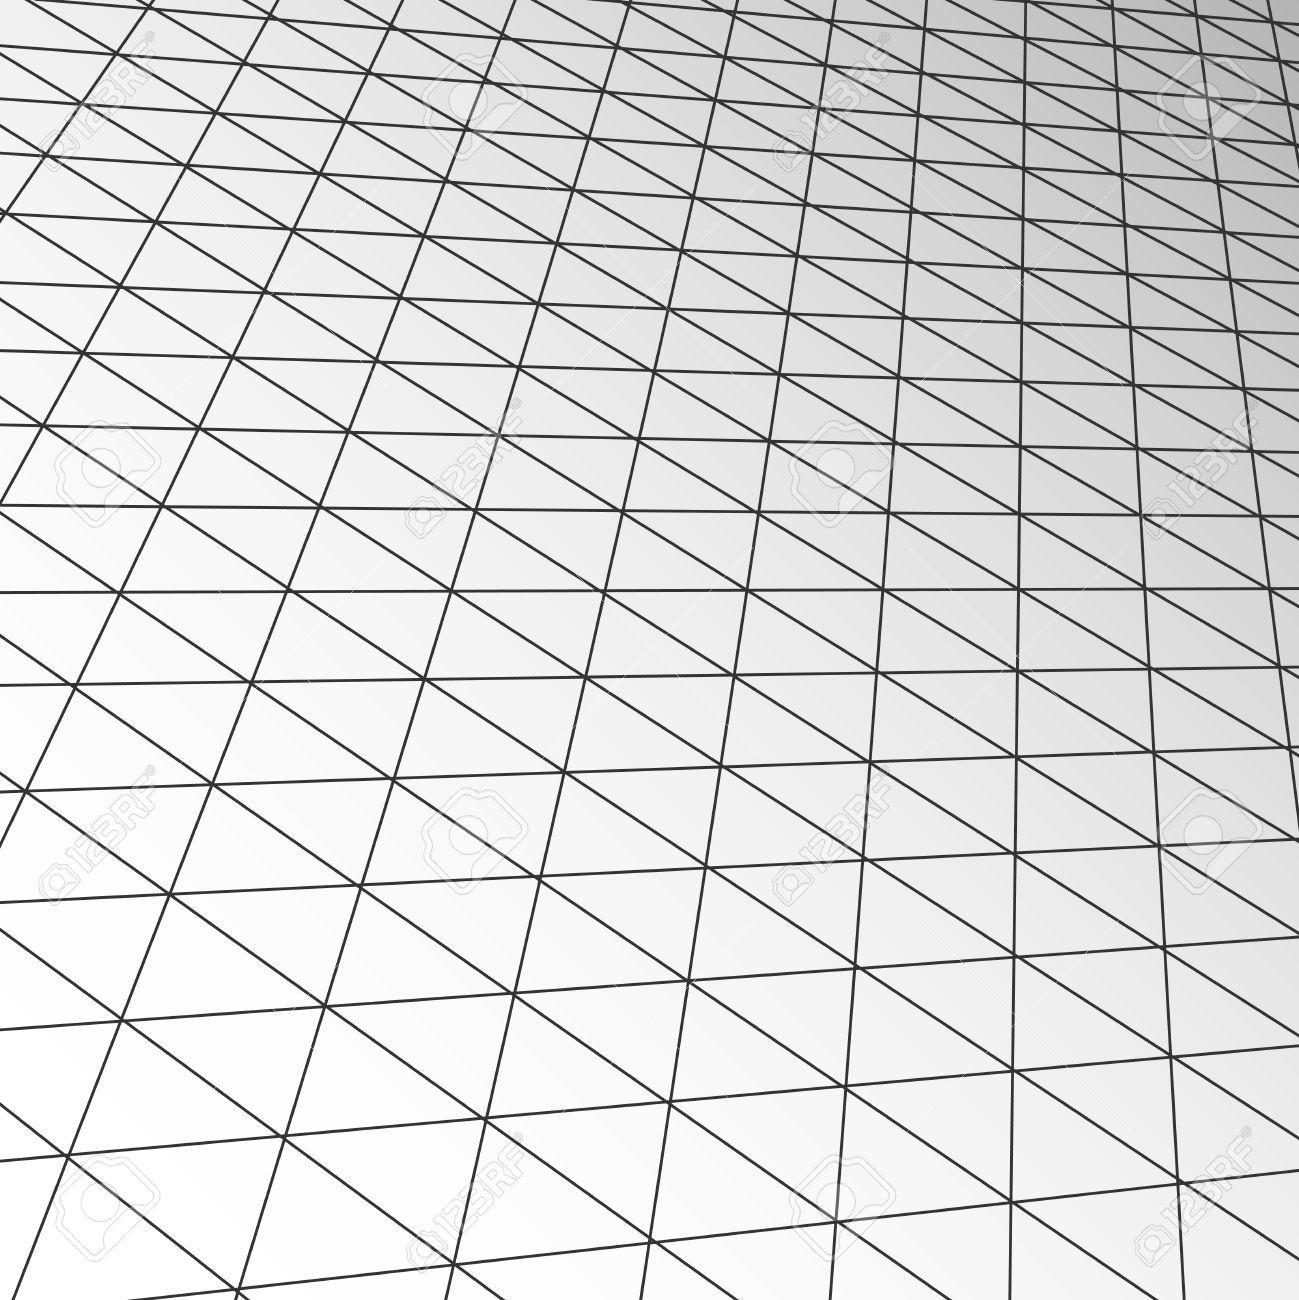 Ceiling tiles grid image collections tile flooring design ideas expansion ceiling tile texture vector technology modern business expansion ceiling tile texture vector technology modern business doublecrazyfo Images